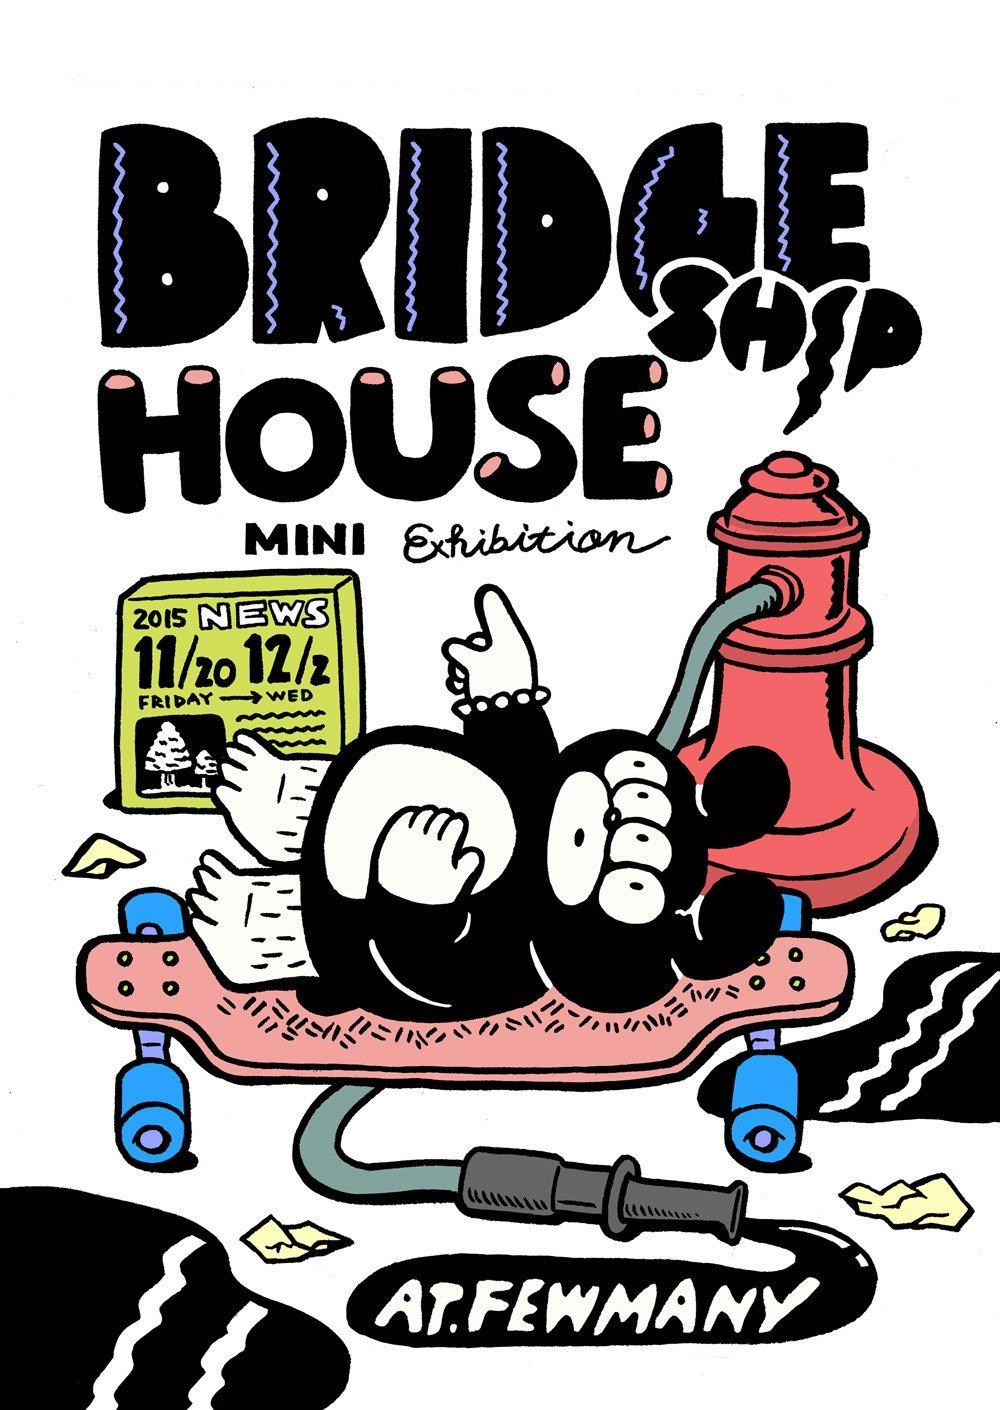 【BRIDGE SHIP HOUSE MINI Exhibition】開催中です!_f0010033_20545170.jpg